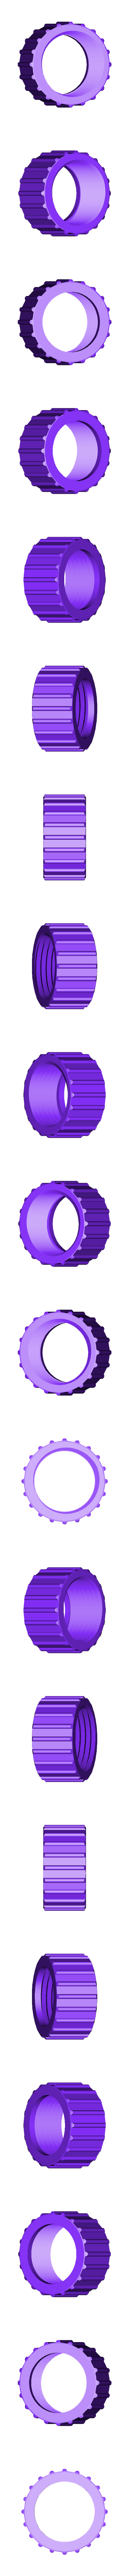 InsideNut.stl Download free STL file Bucket hose adapter connector • 3D printer model, Hobb3s